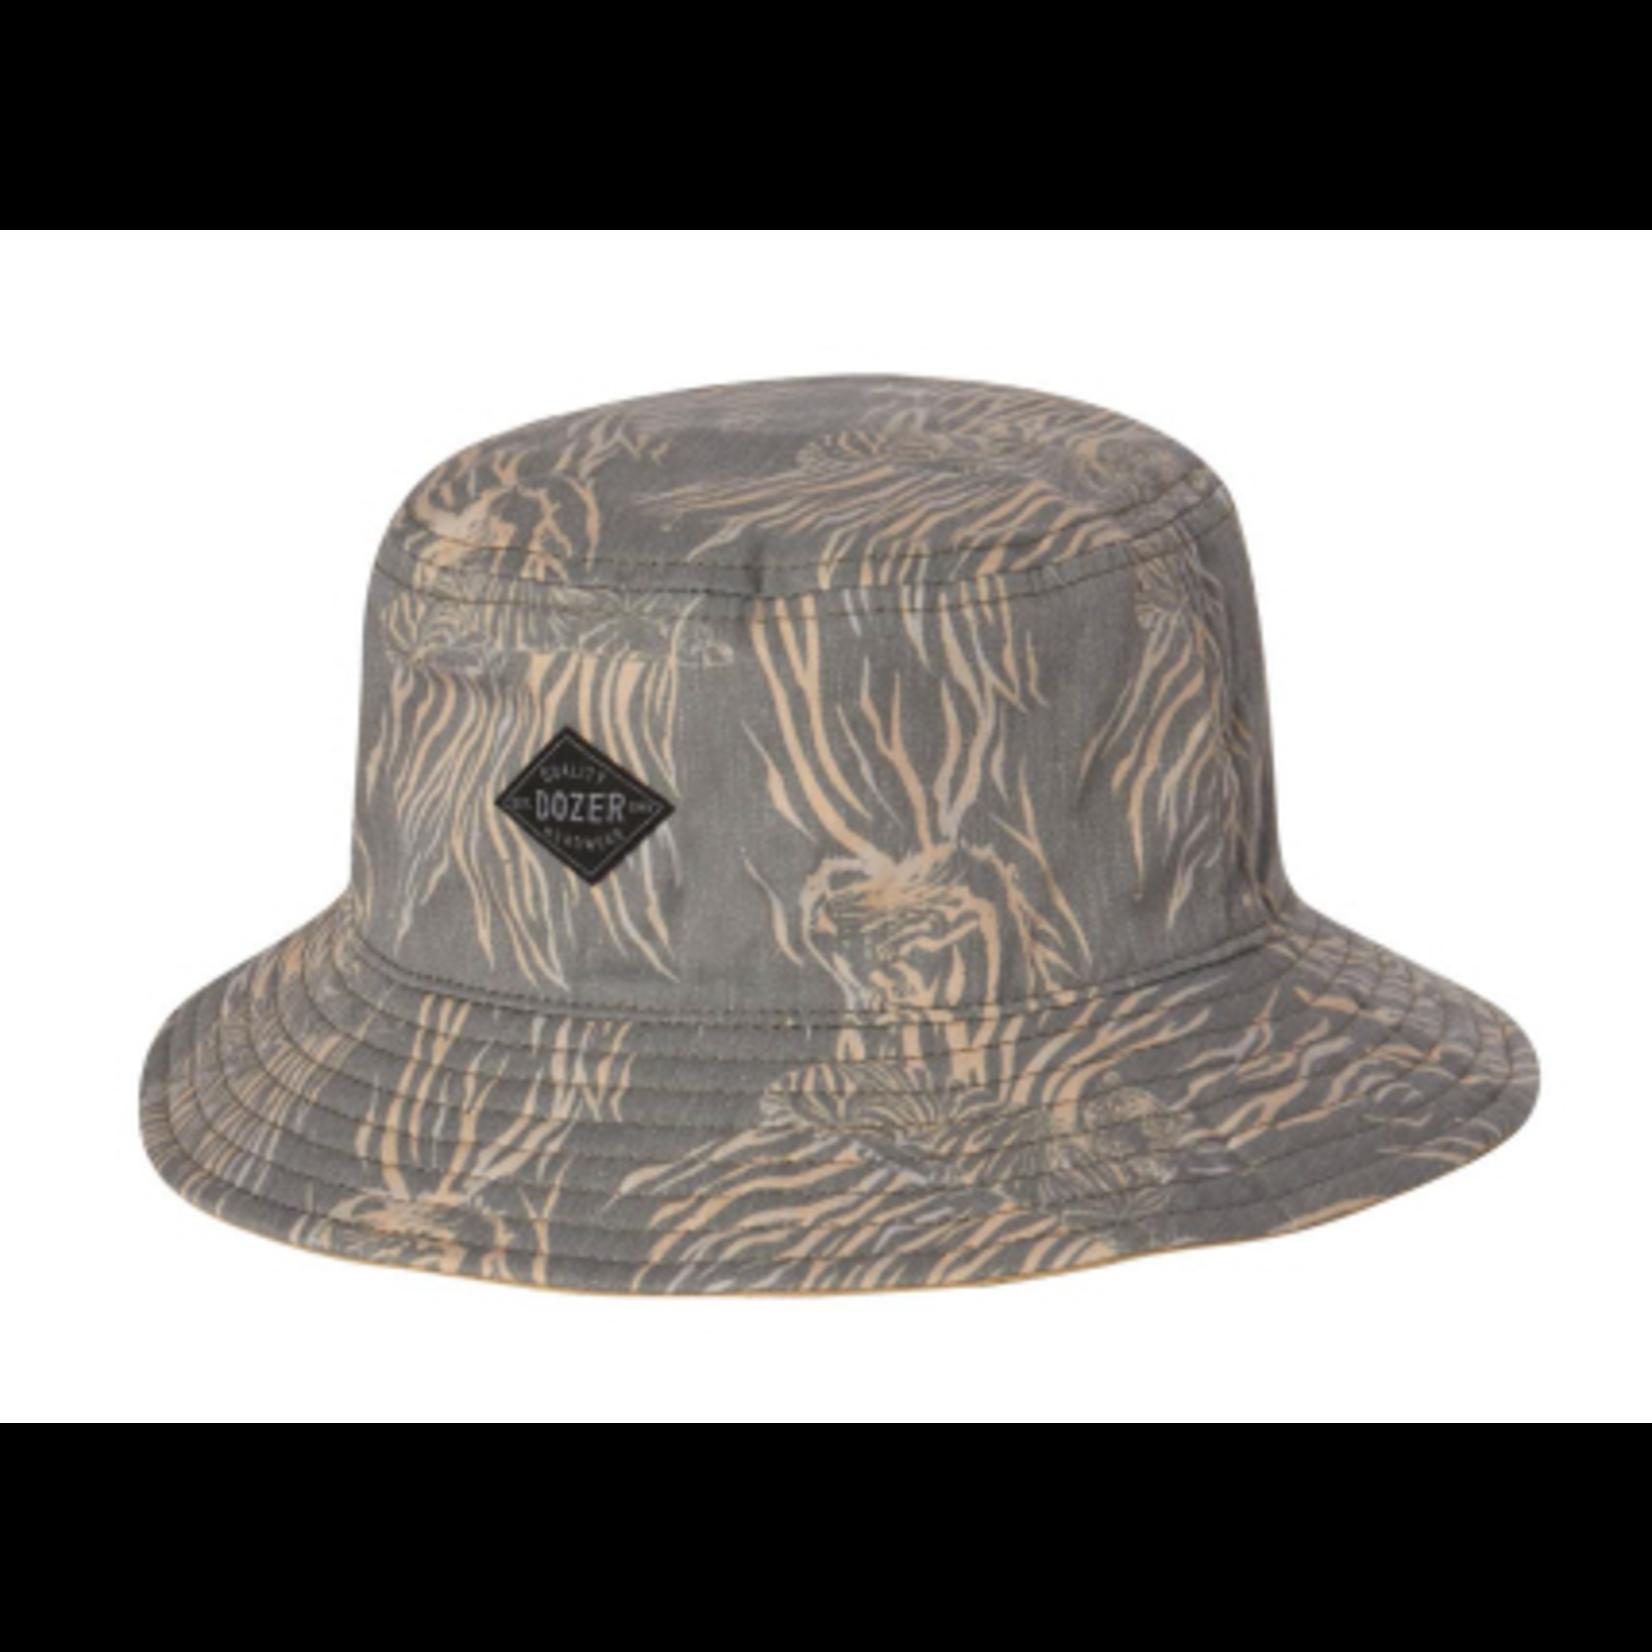 Millymook and Dozer Boys Bucket Sun Hat - Channing